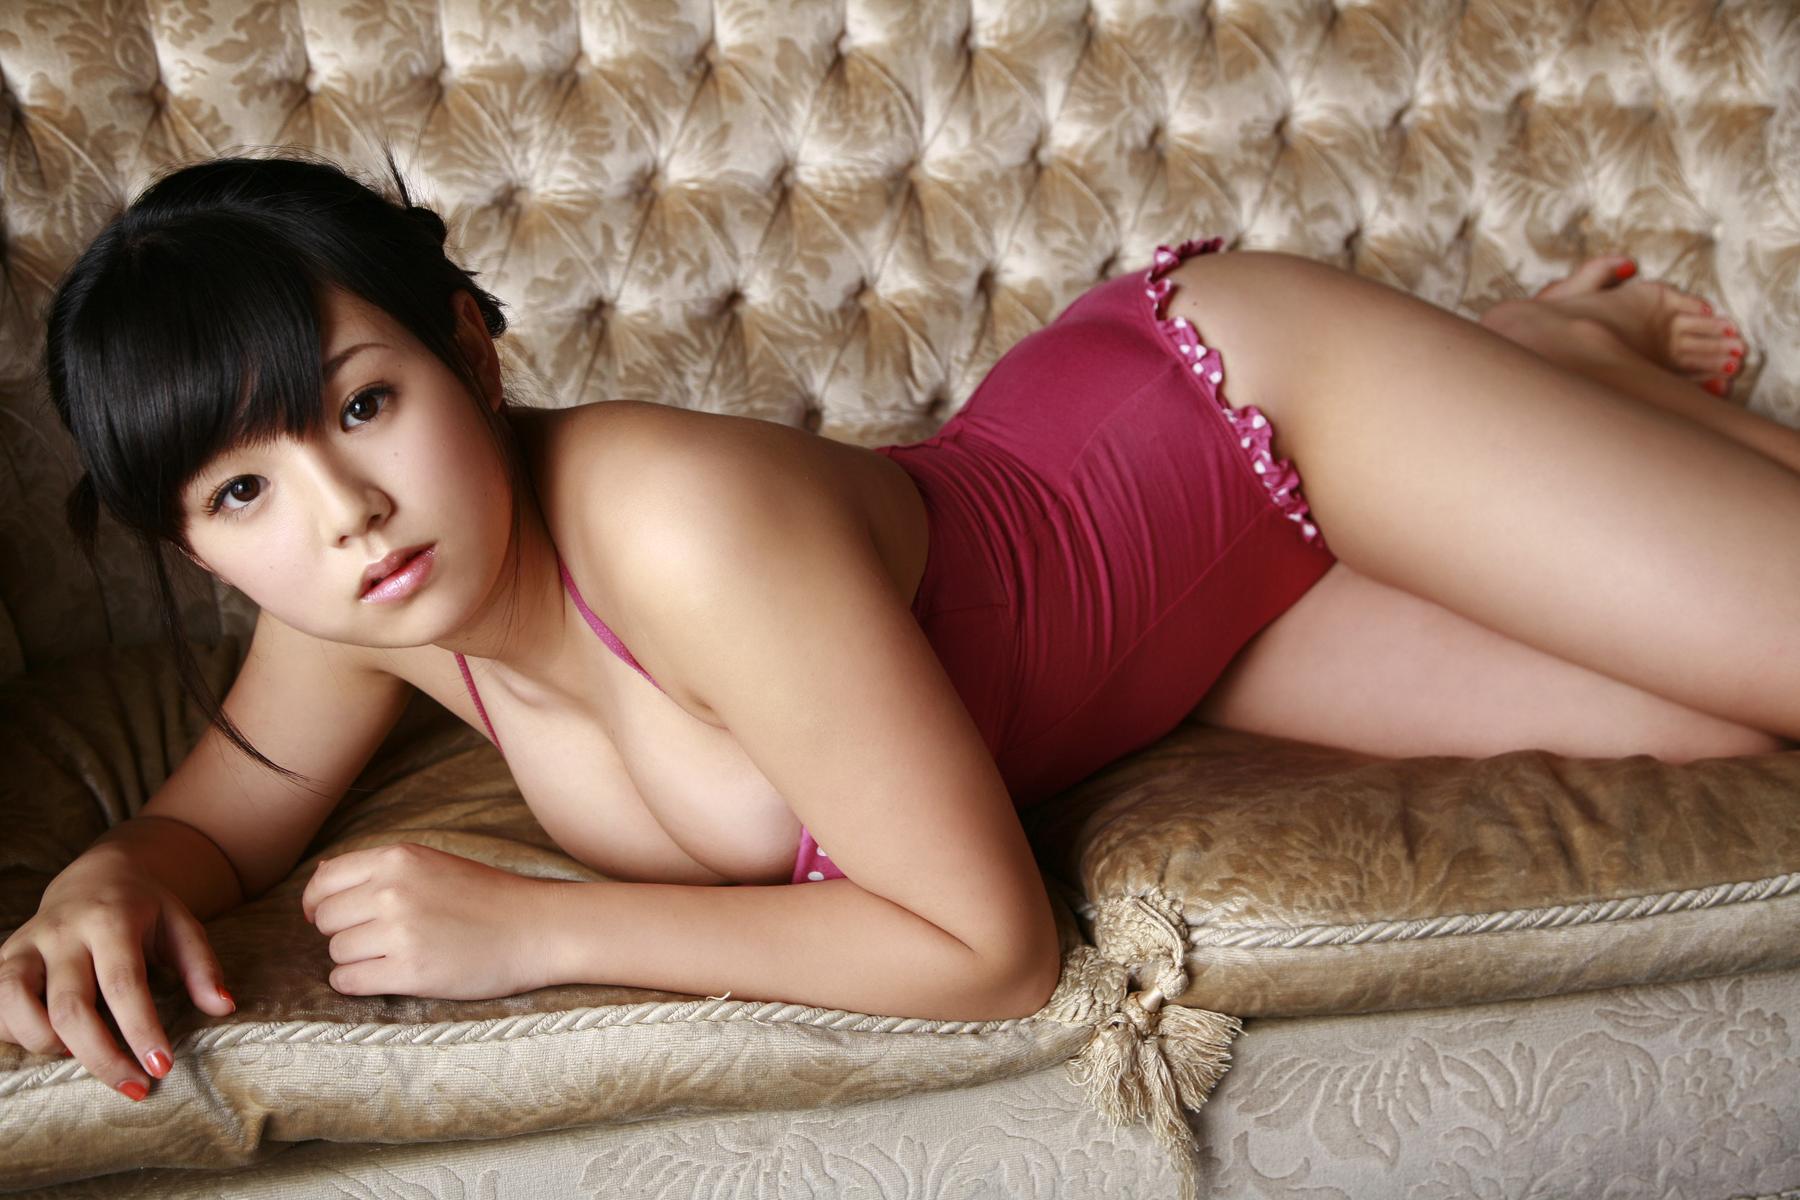 Порно фото поп и писек #9